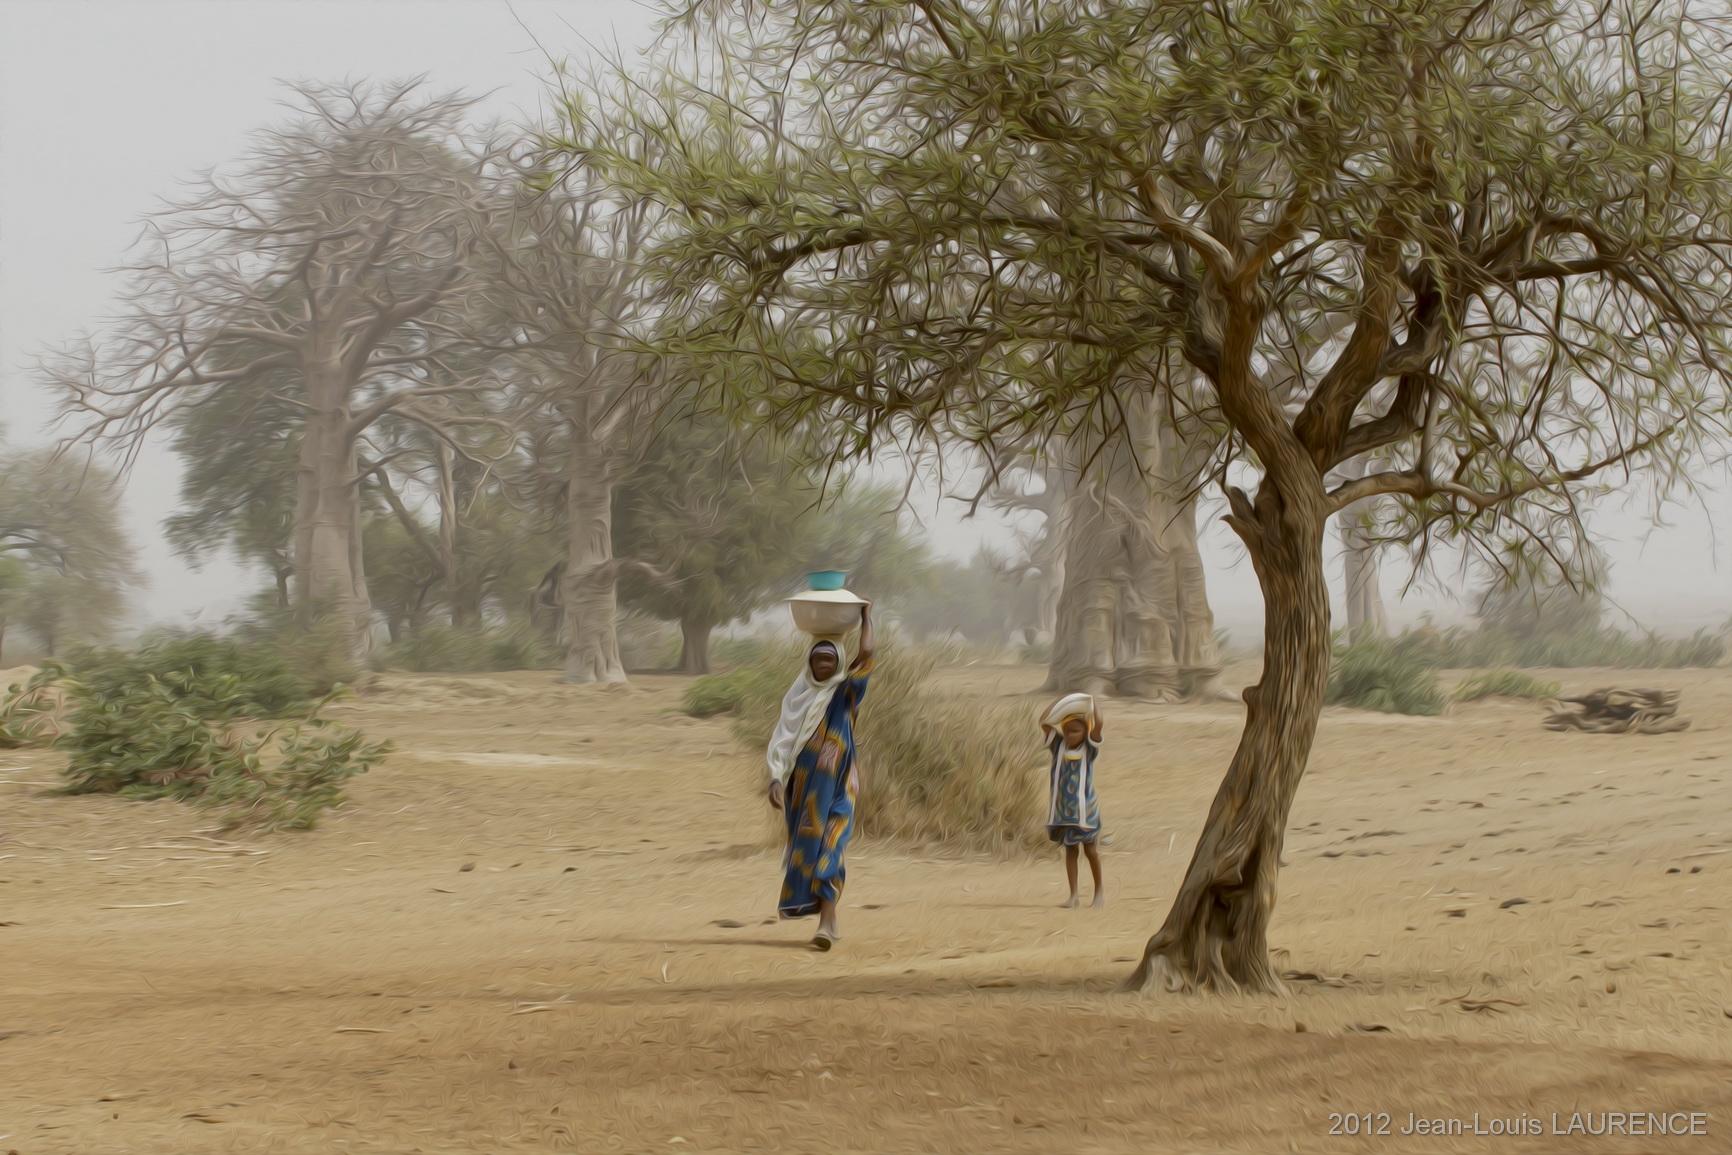 La femme, l'enfant et les baobabs, nord Bénin